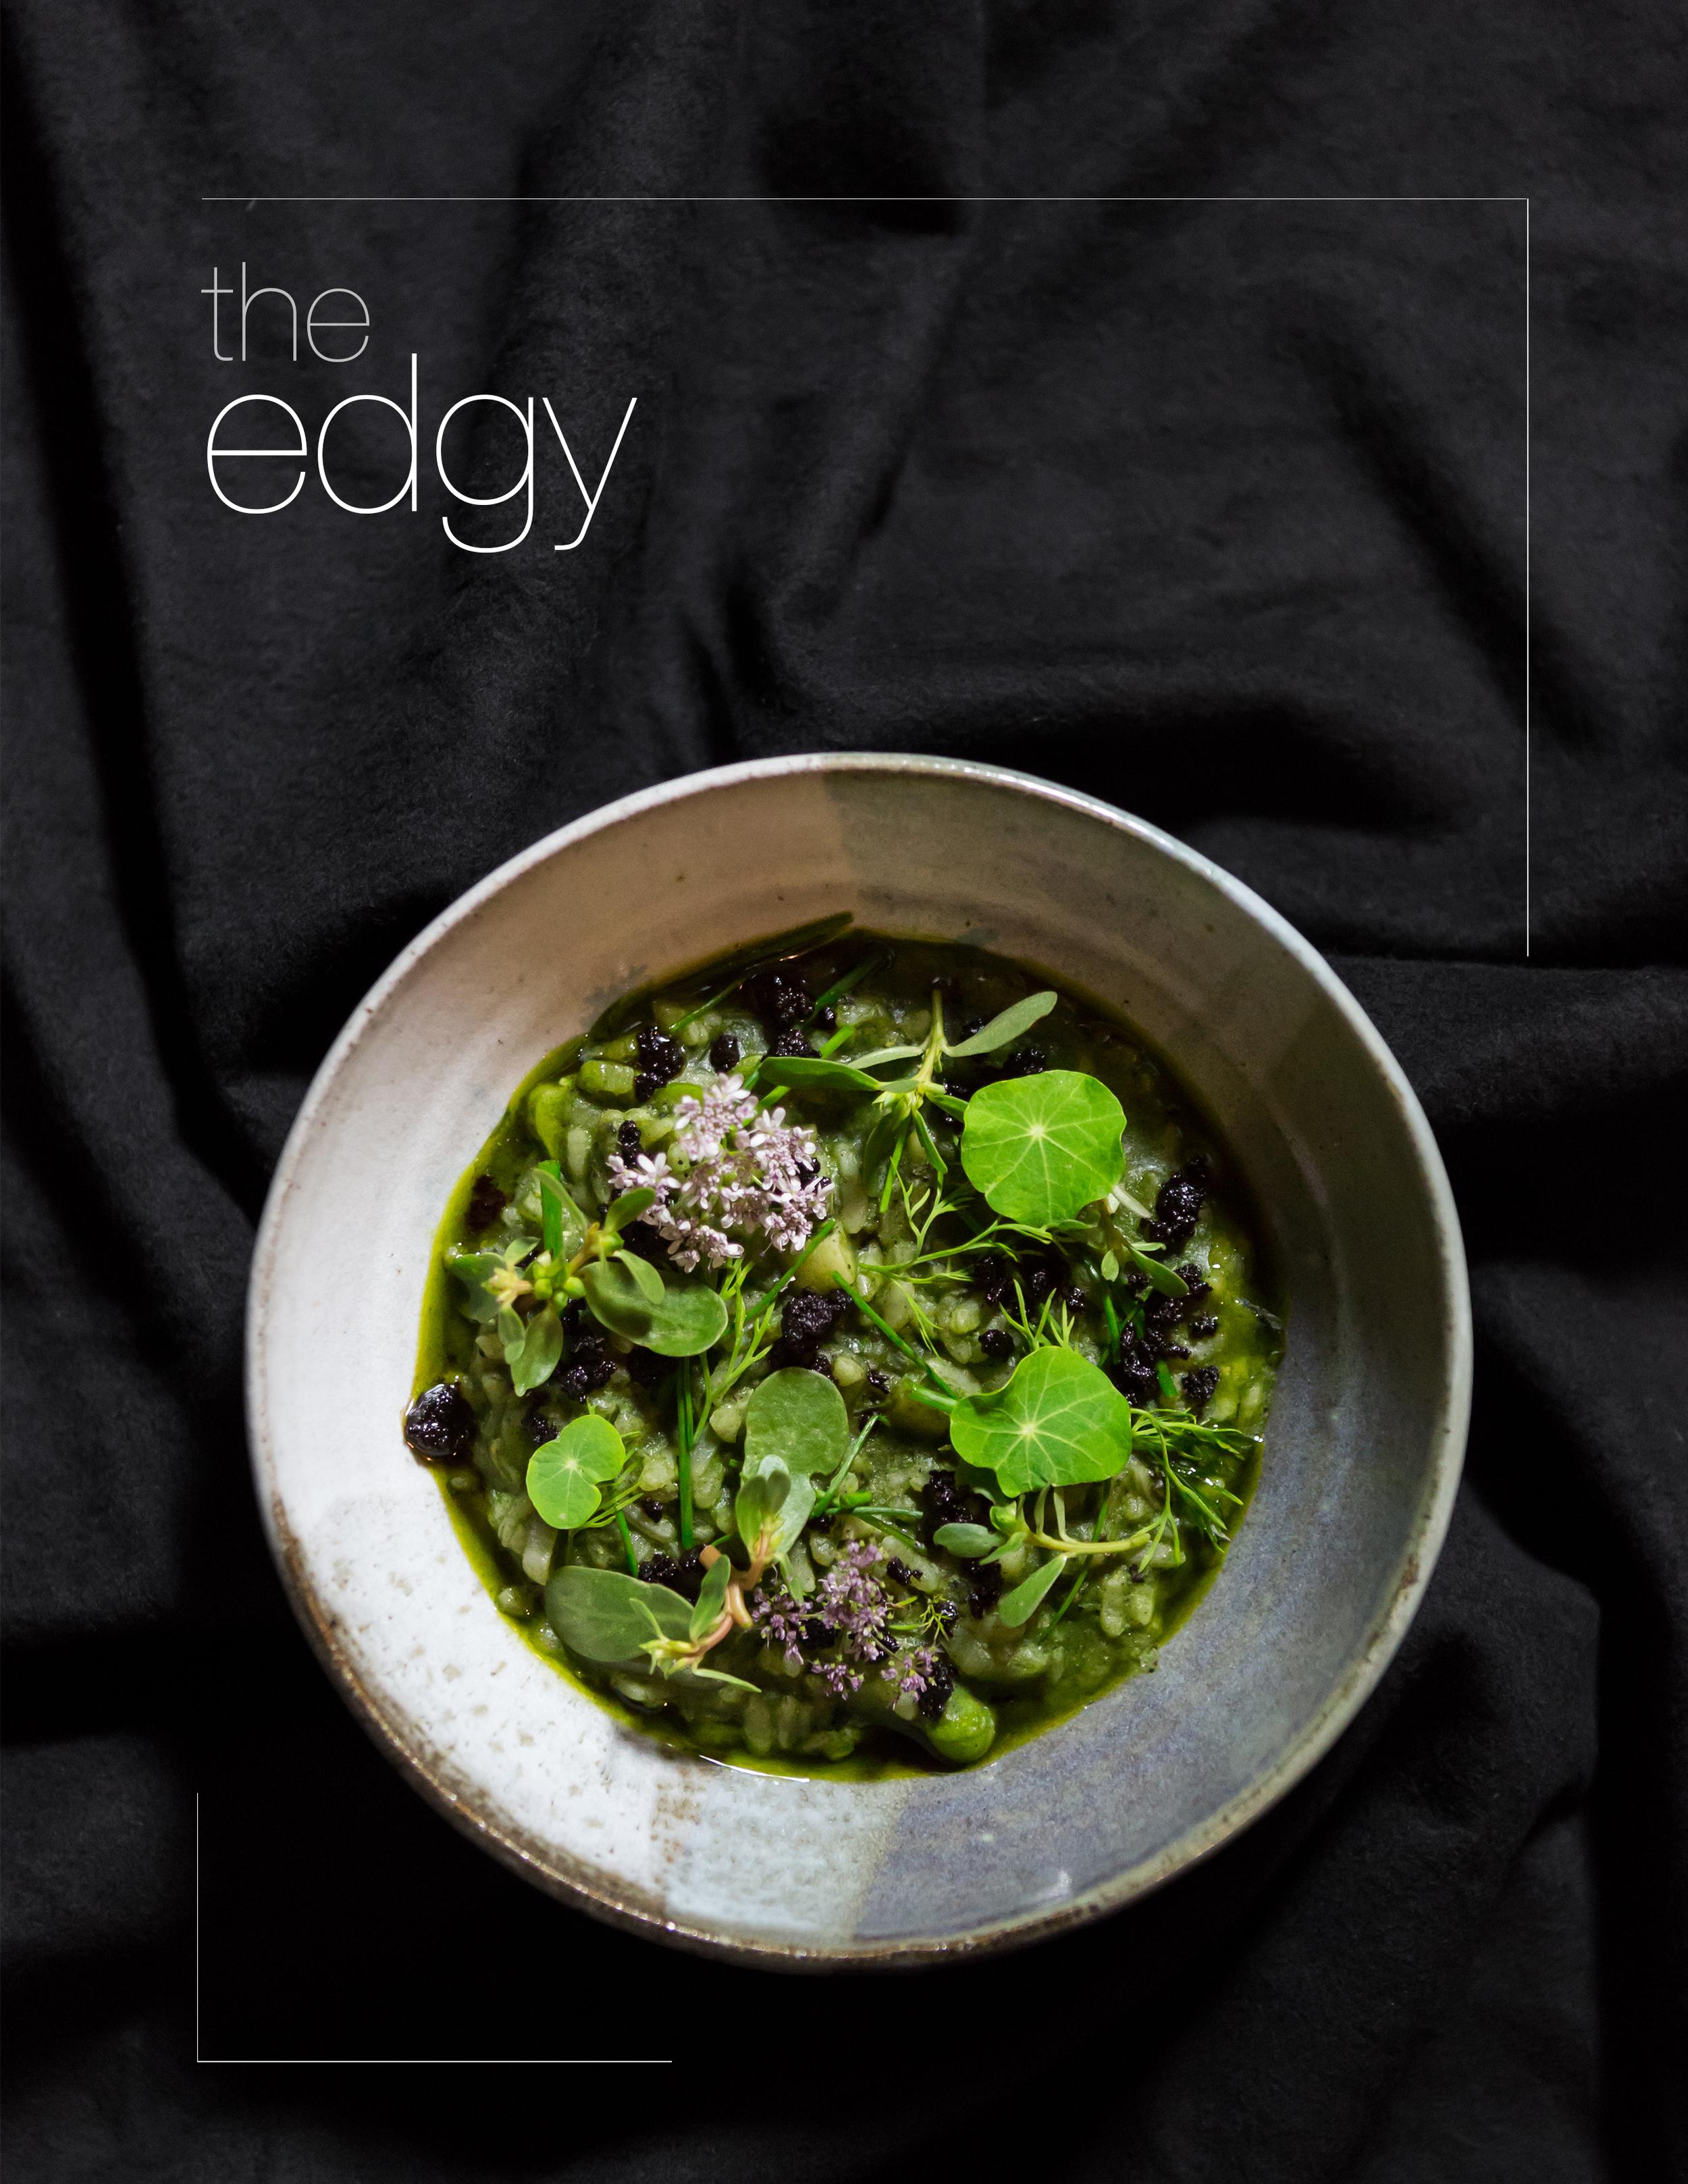 The Edgy WEBB.jpg